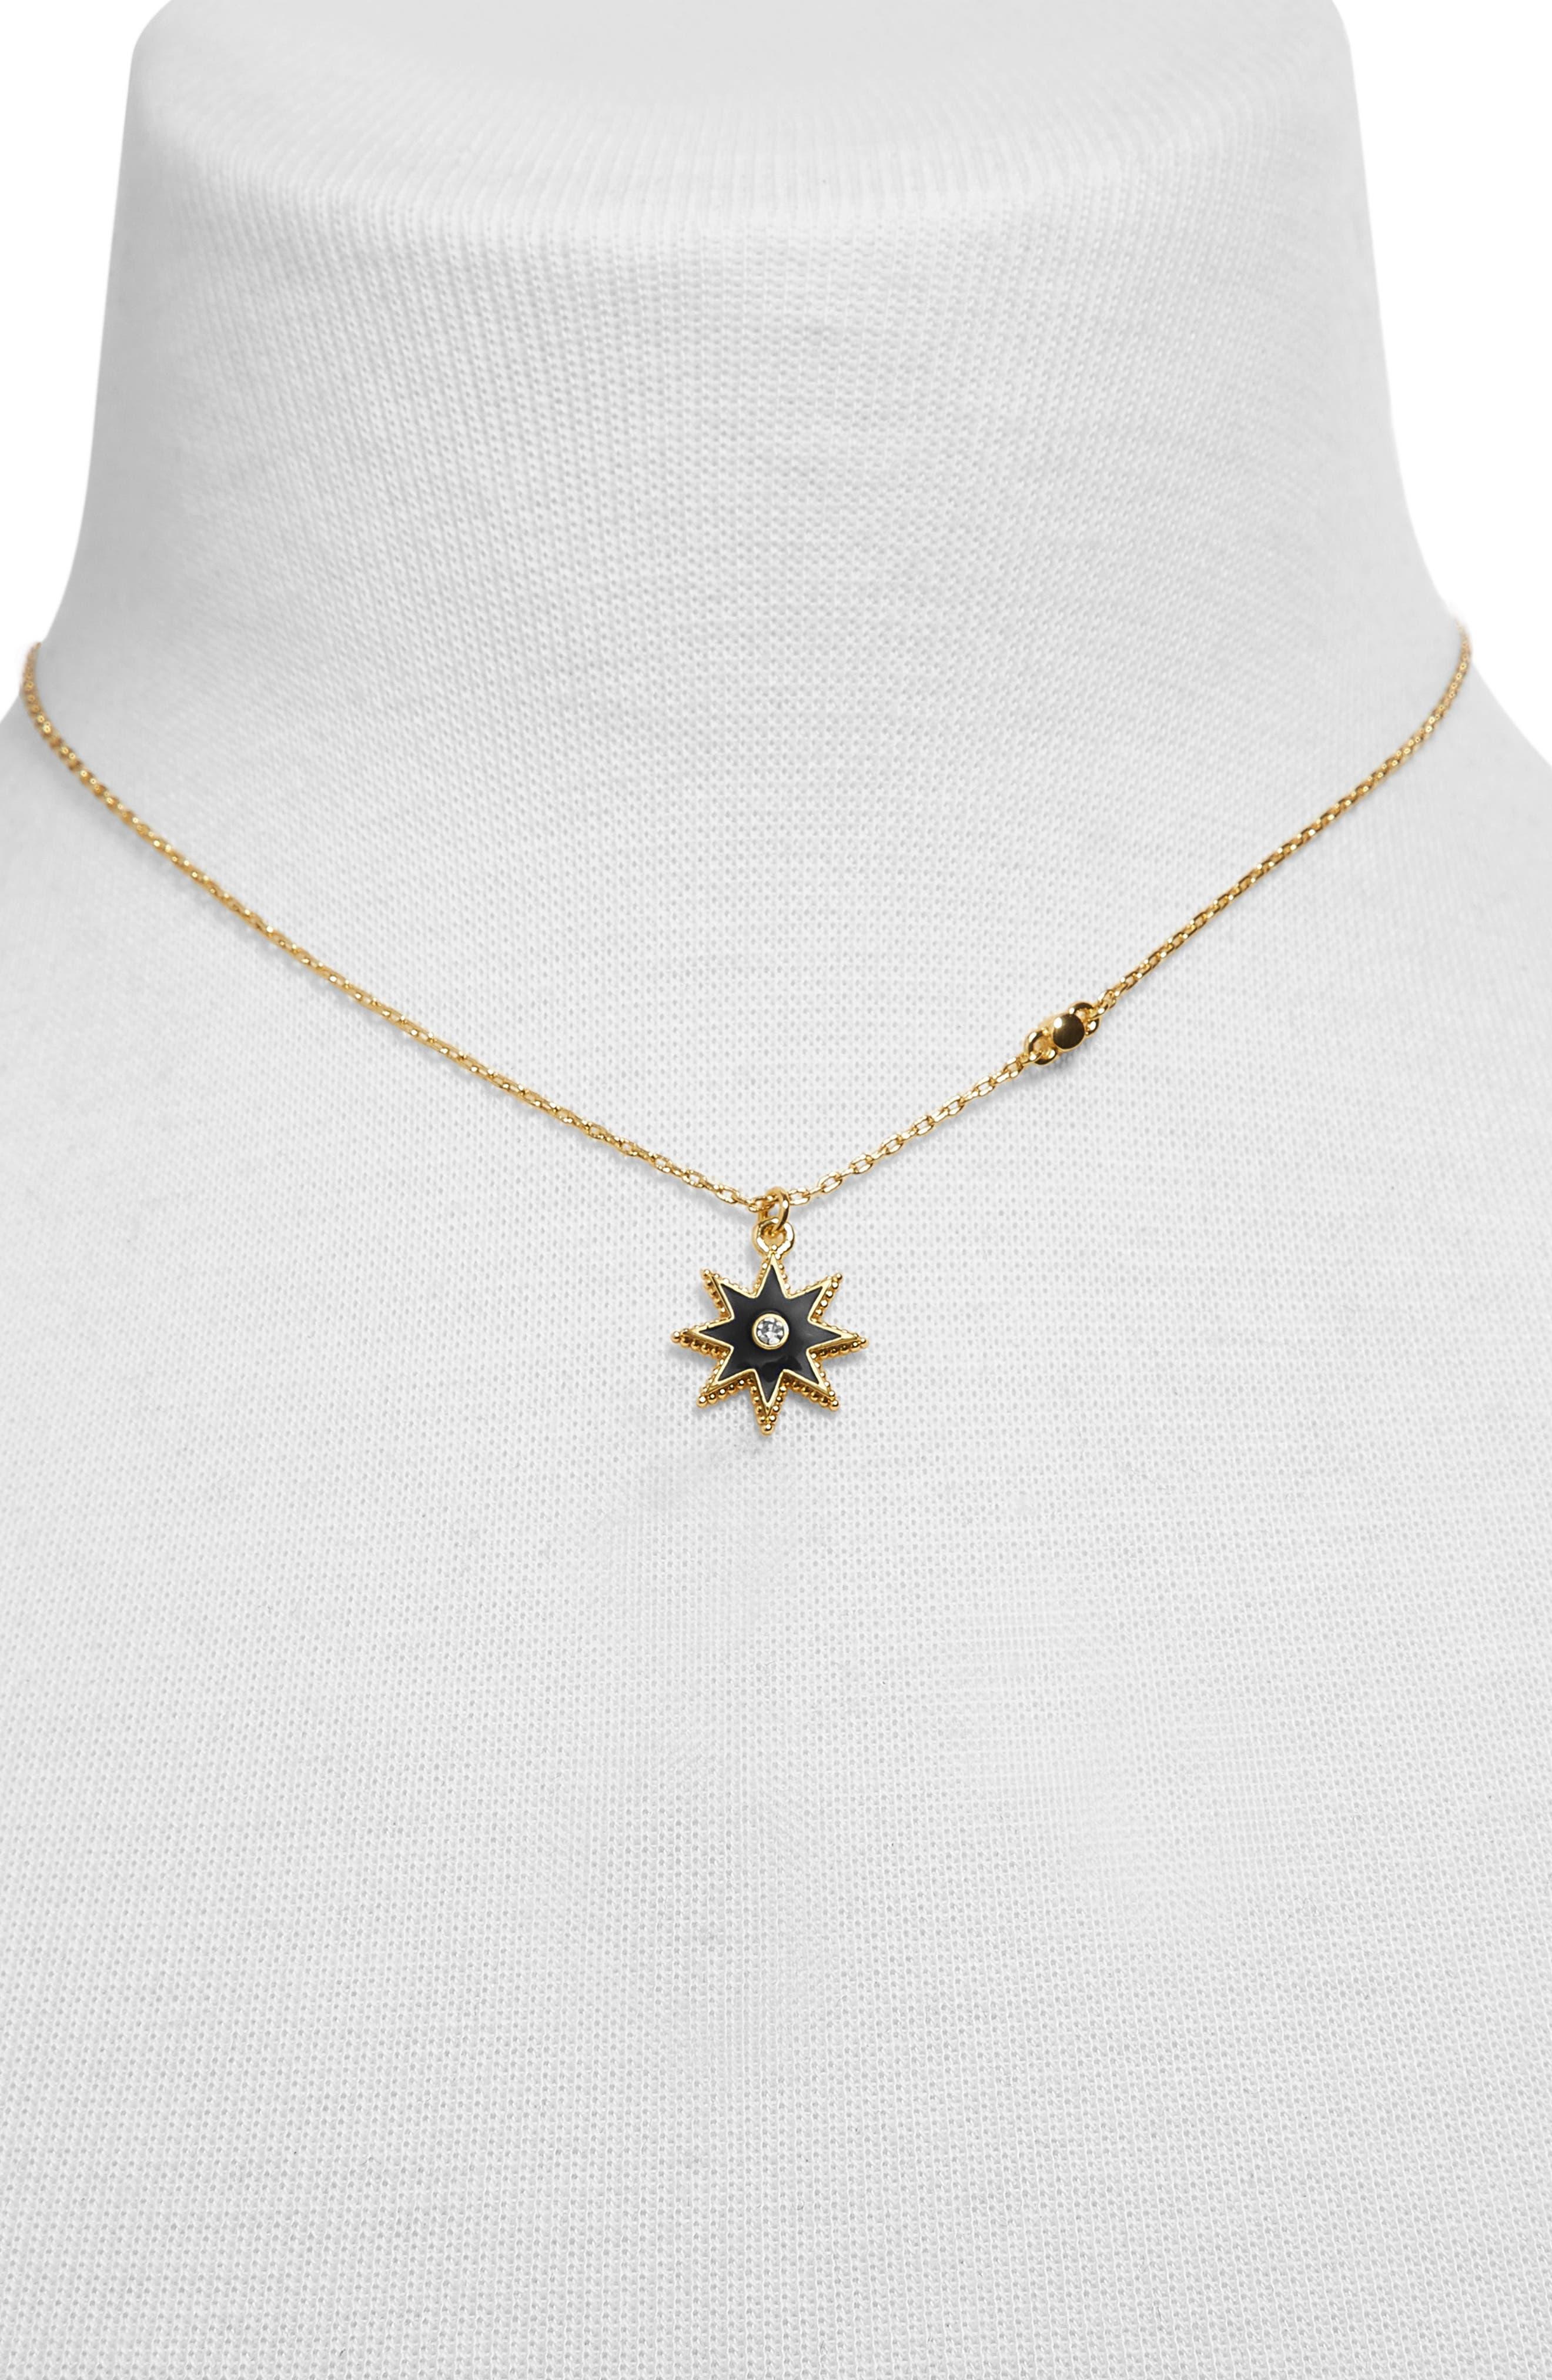 BAUBLEBAR, Merralina Star Pendant Necklace, Alternate thumbnail 2, color, 710